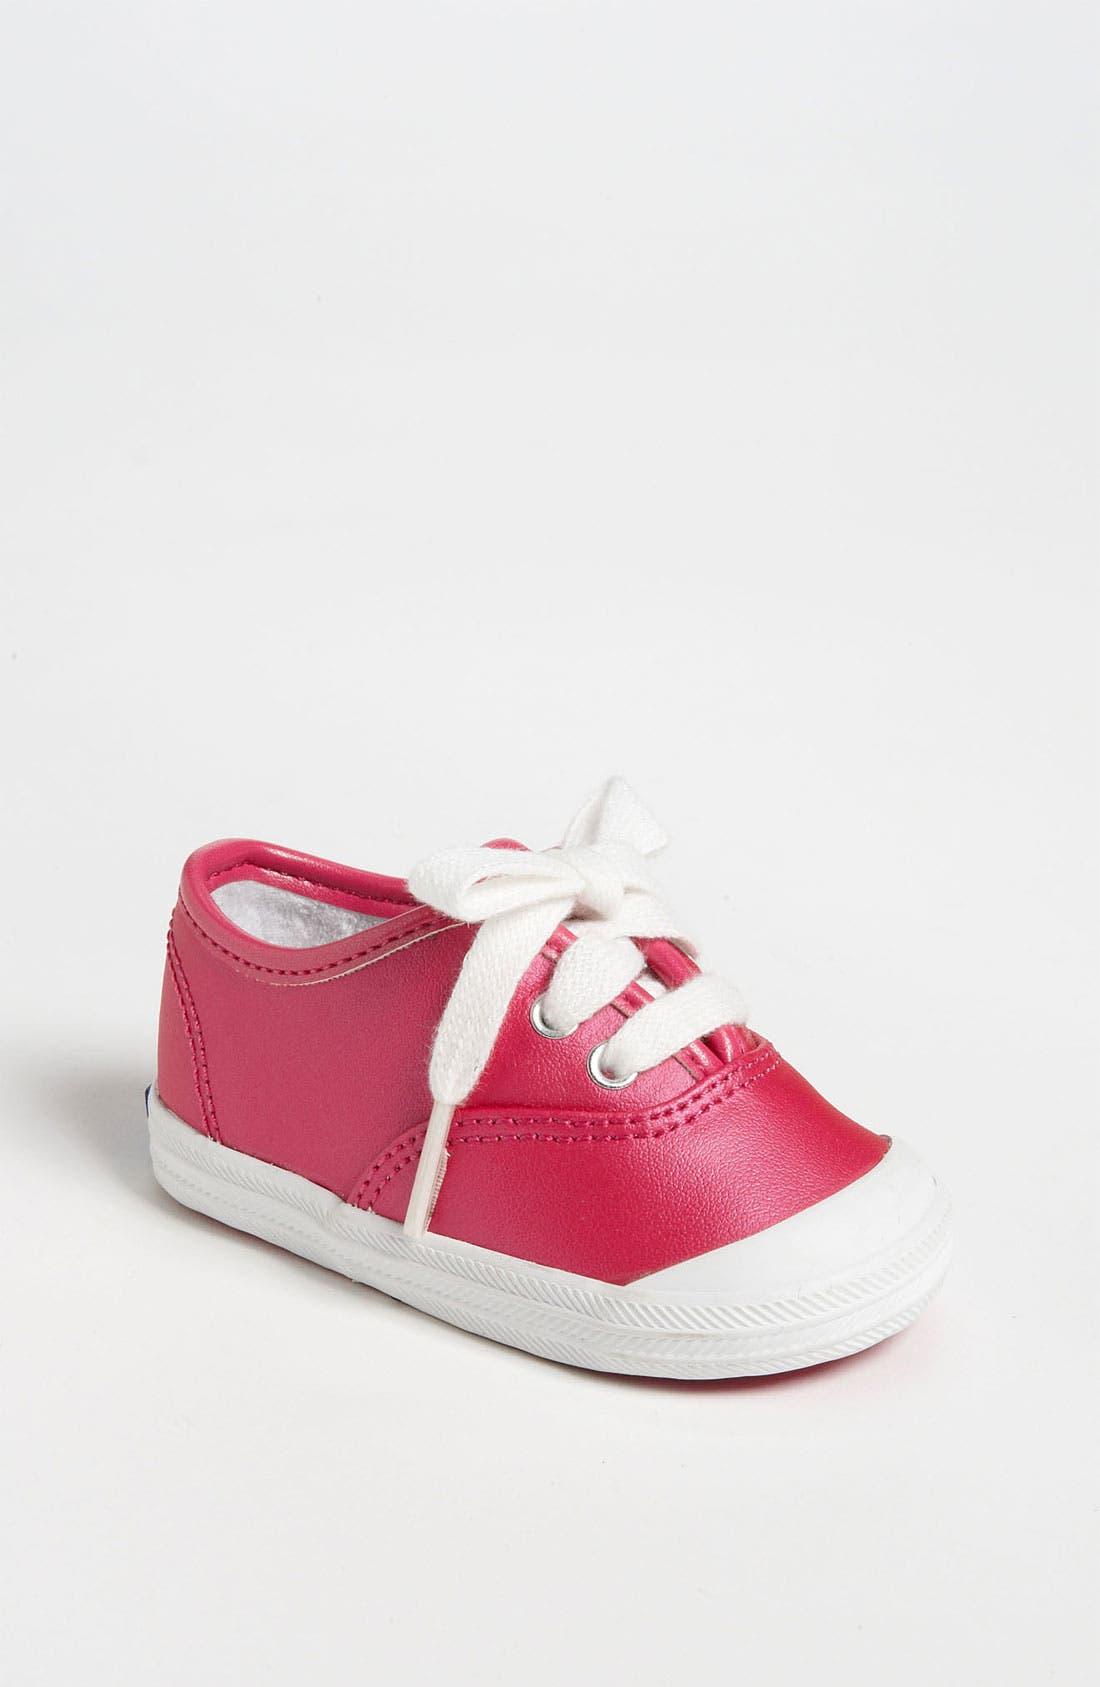 Main Image - Keds® 'Champion' Crib Shoe (Baby)